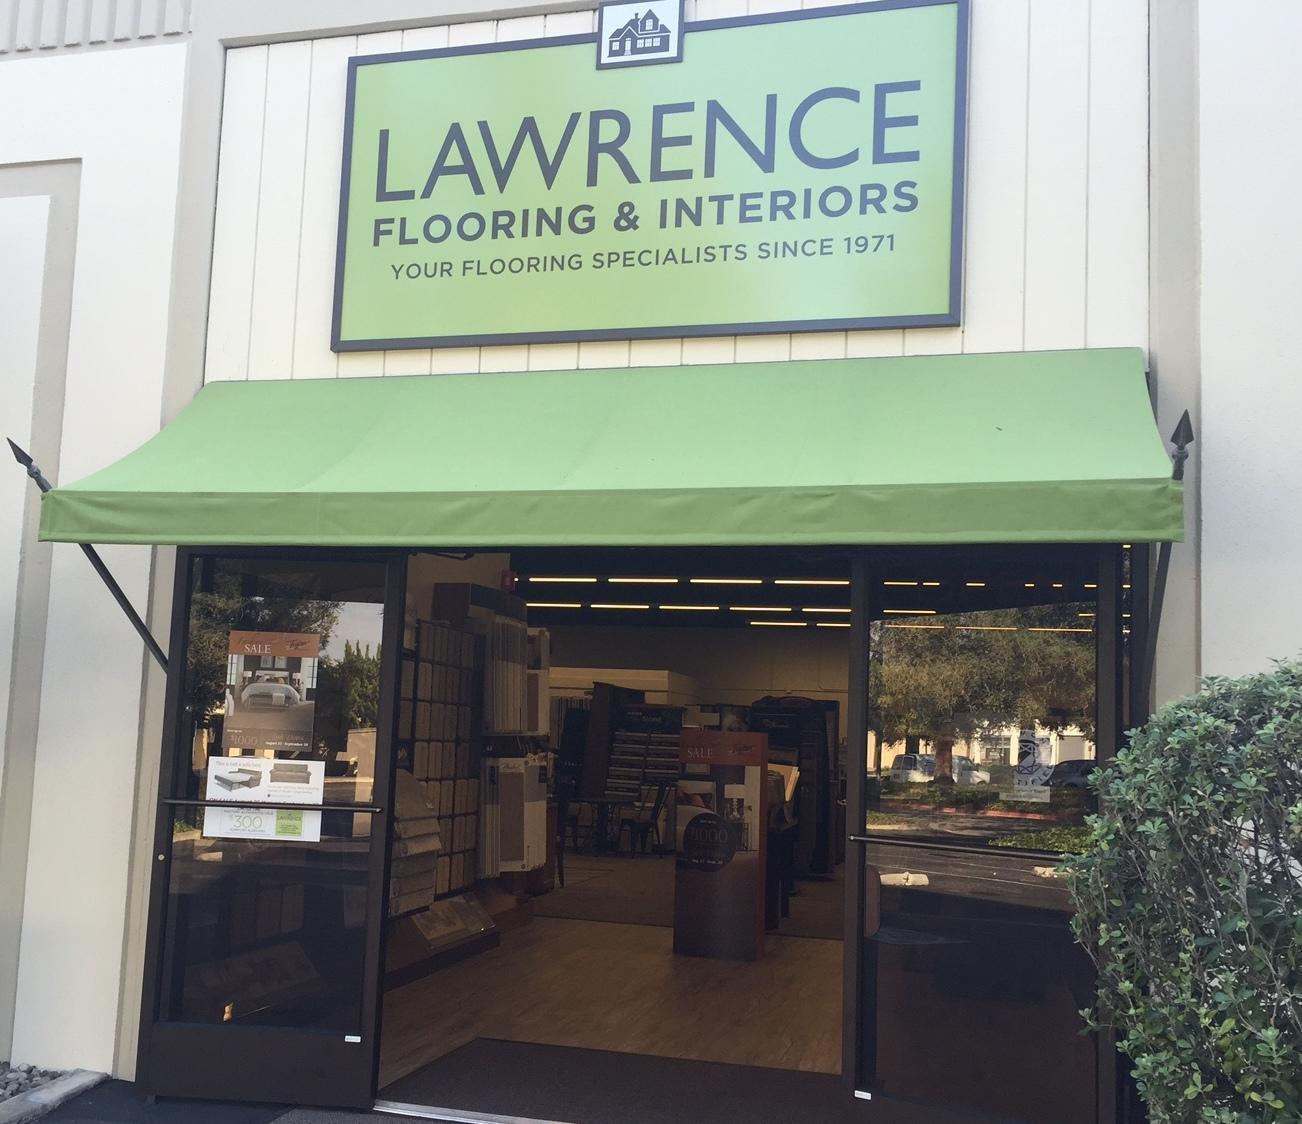 Lawrence Flooring & Interiors image 70